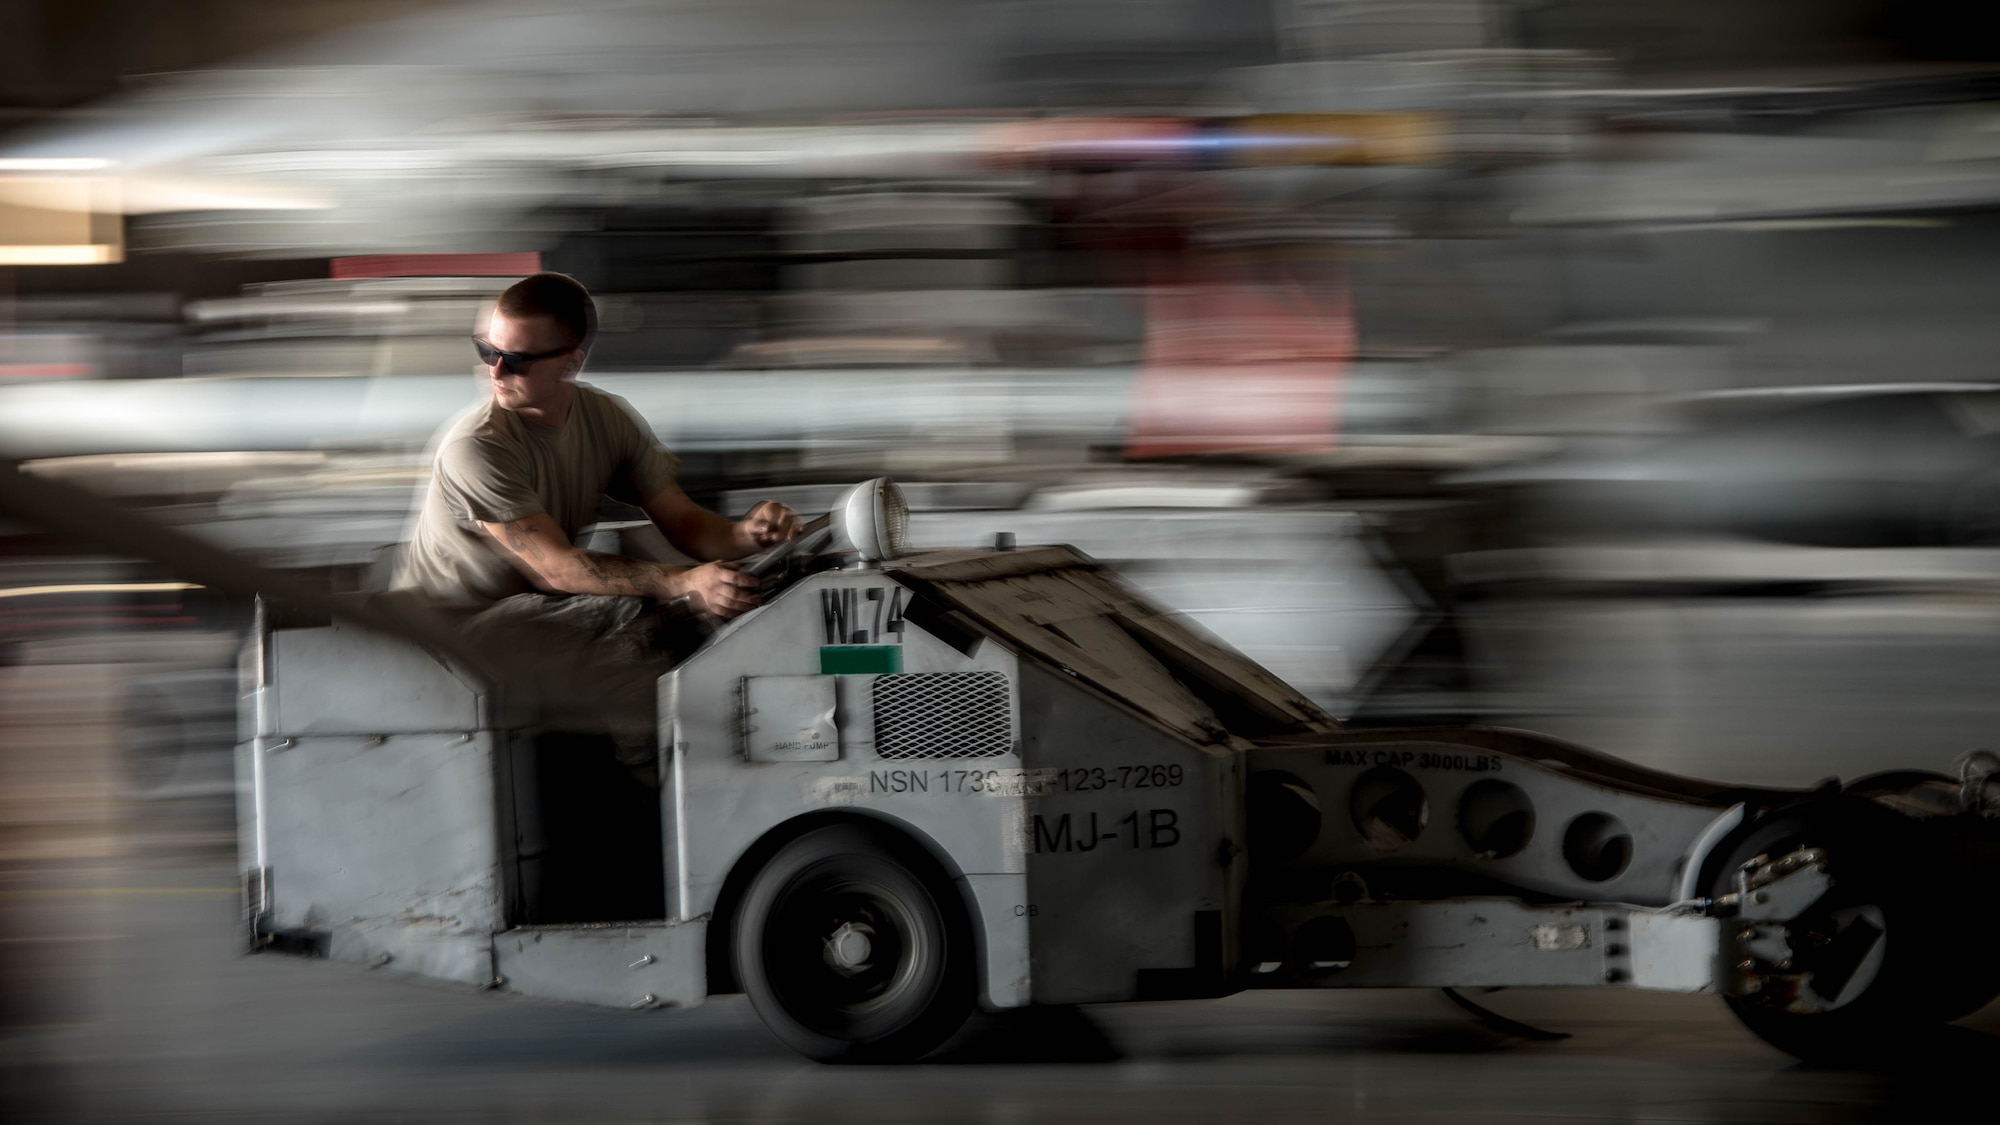 U.S. Air Force Senior Airman James Bridge, 77th Aircraft Maintenance Unit load crew team member, operates a bomb loader at Shaw Air Force Base, S.C., Aug. 9, 2018.